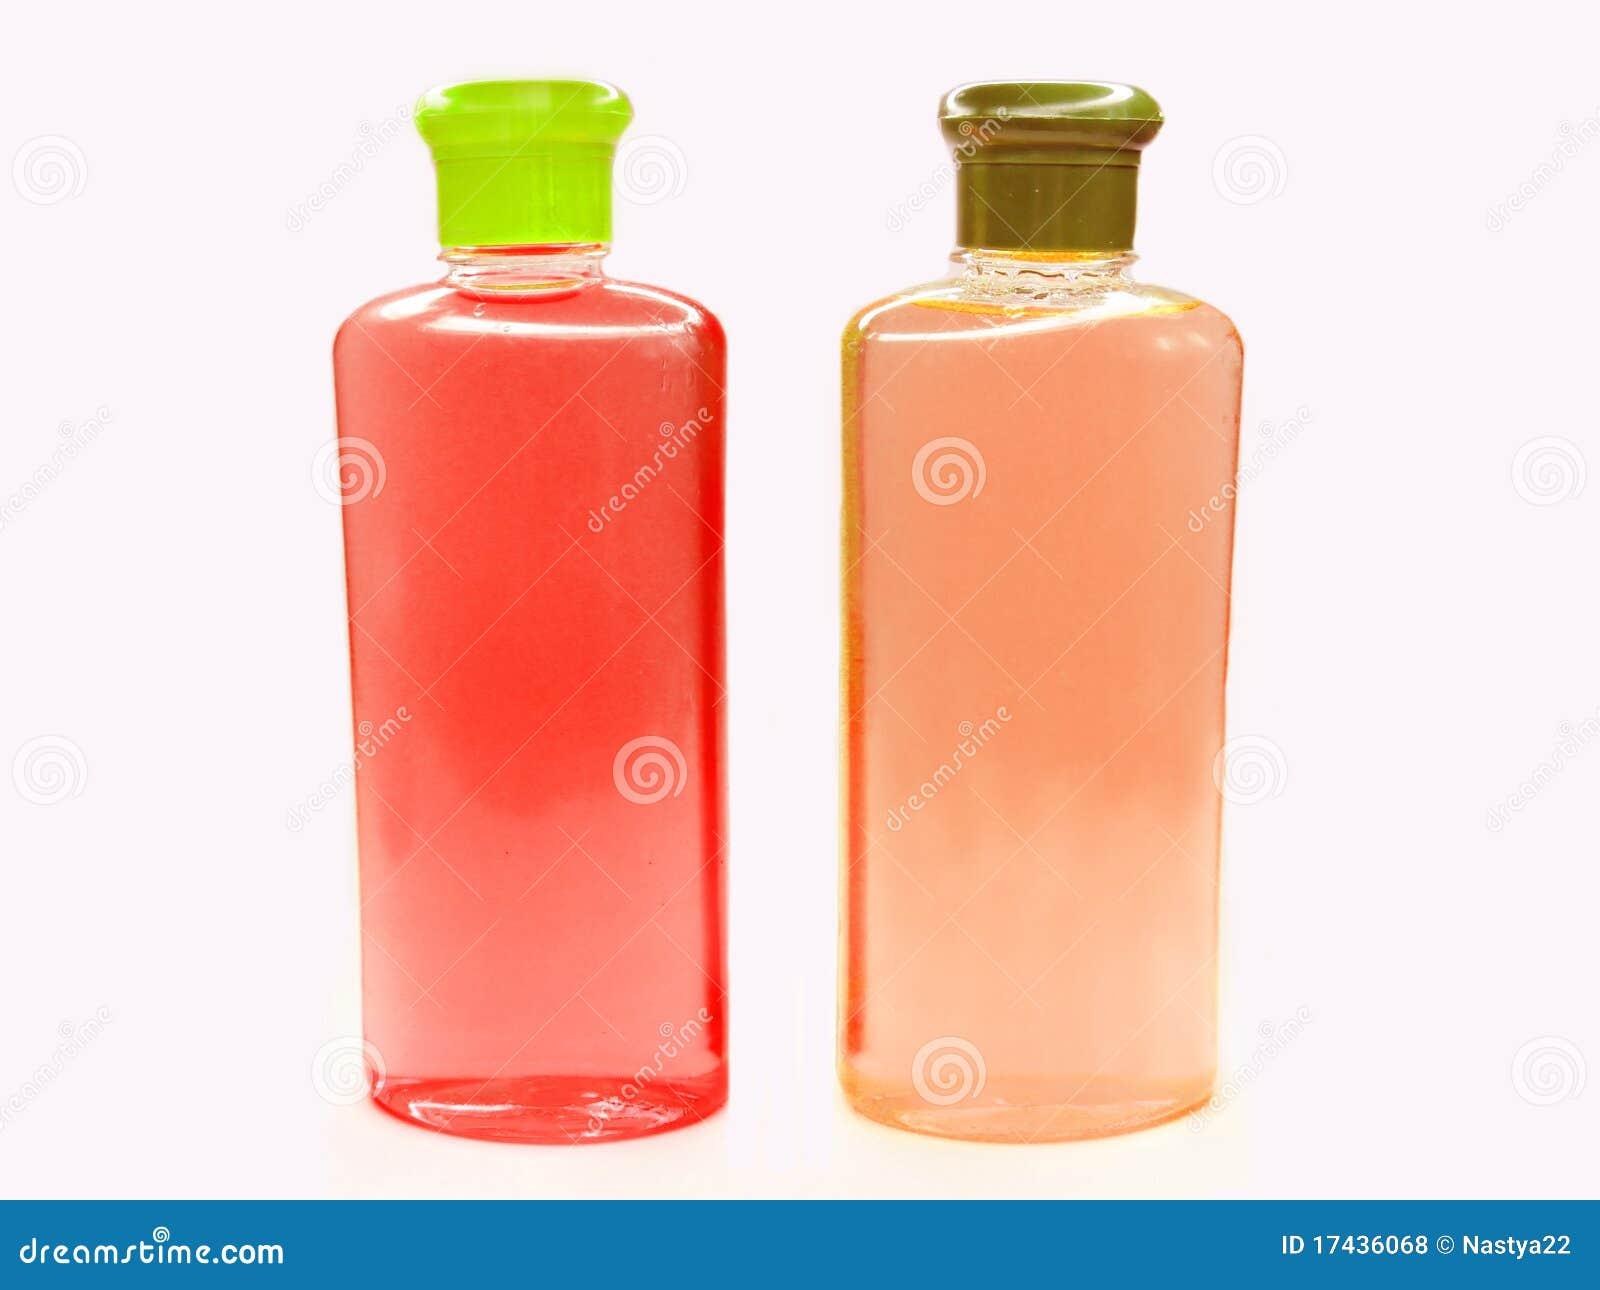 Shampoo Bottle Clip Art Two bottles of fruit shampoo